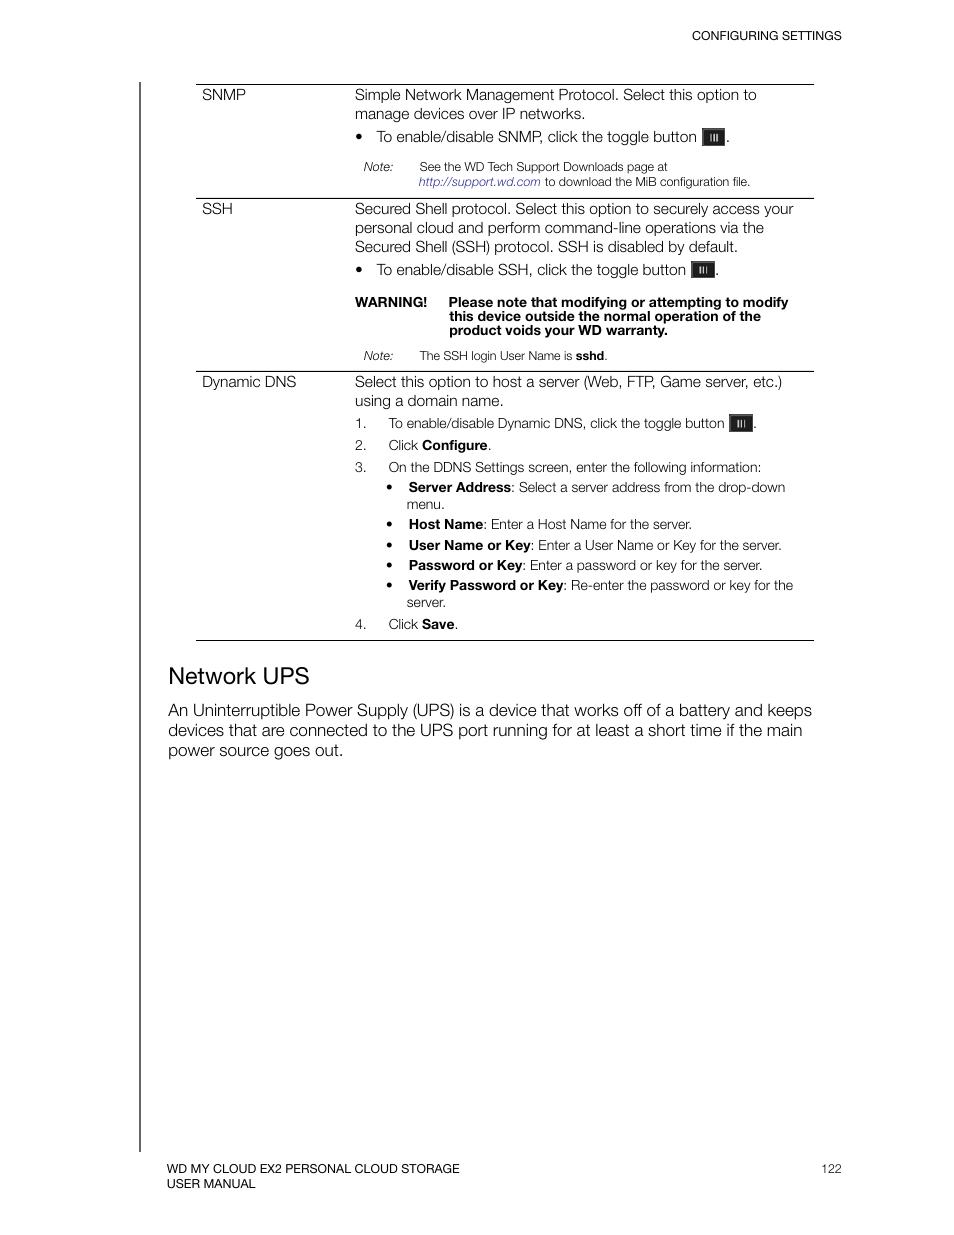 Network ups | Western Digital My Cloud EX2 User Manual User